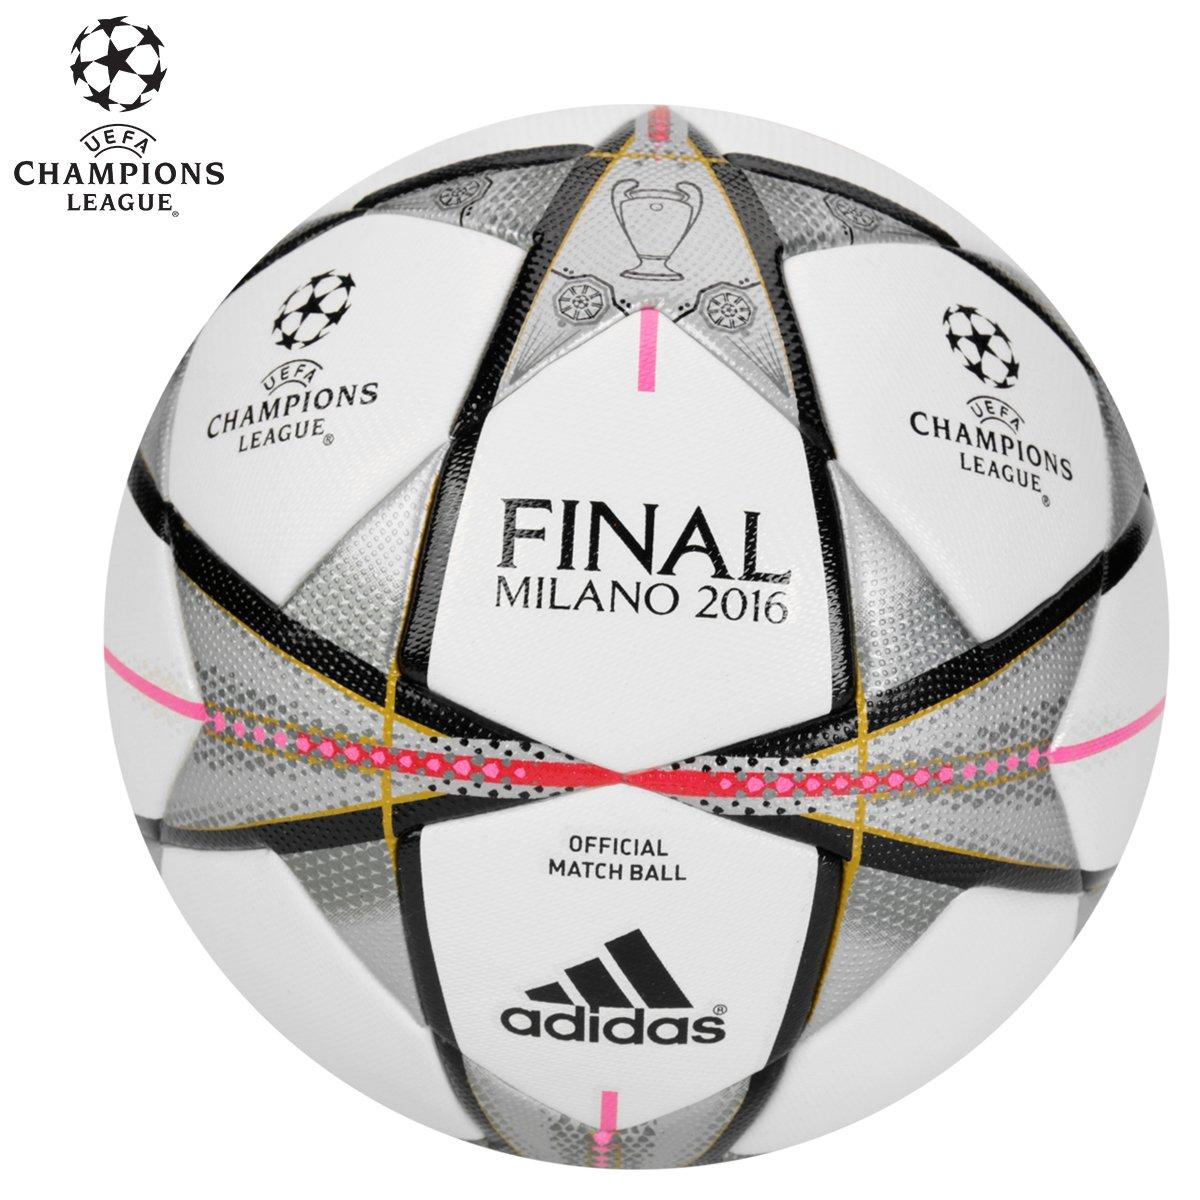 Bola Futebol Adidas Finale Milano 2016 OMB Oficial Campo - Compre Agora  e8a068b7ad5c5